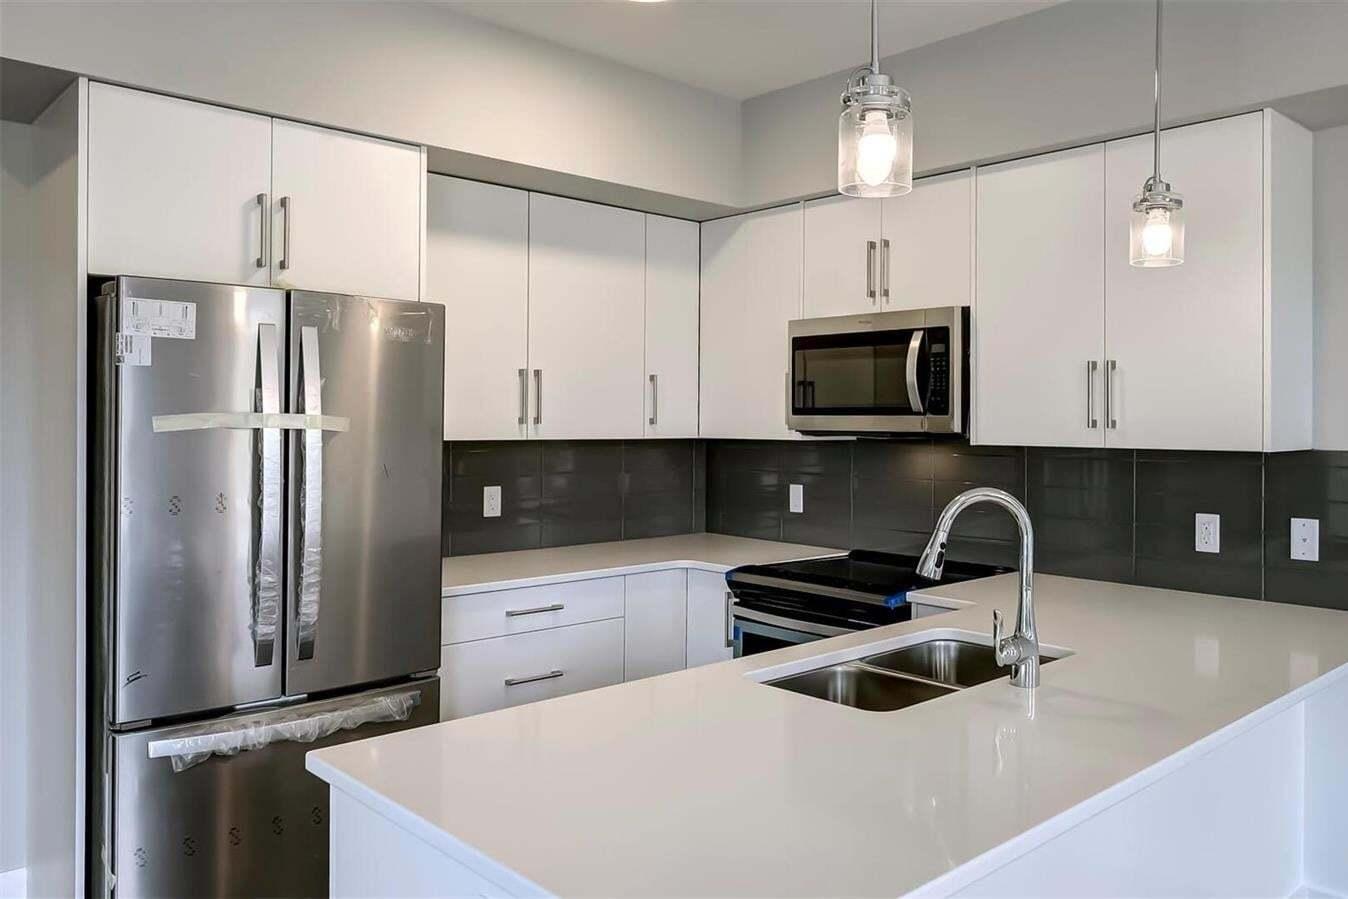 Condo for sale at 3090 Burtch Rd Kelowna British Columbia - MLS: 10212252